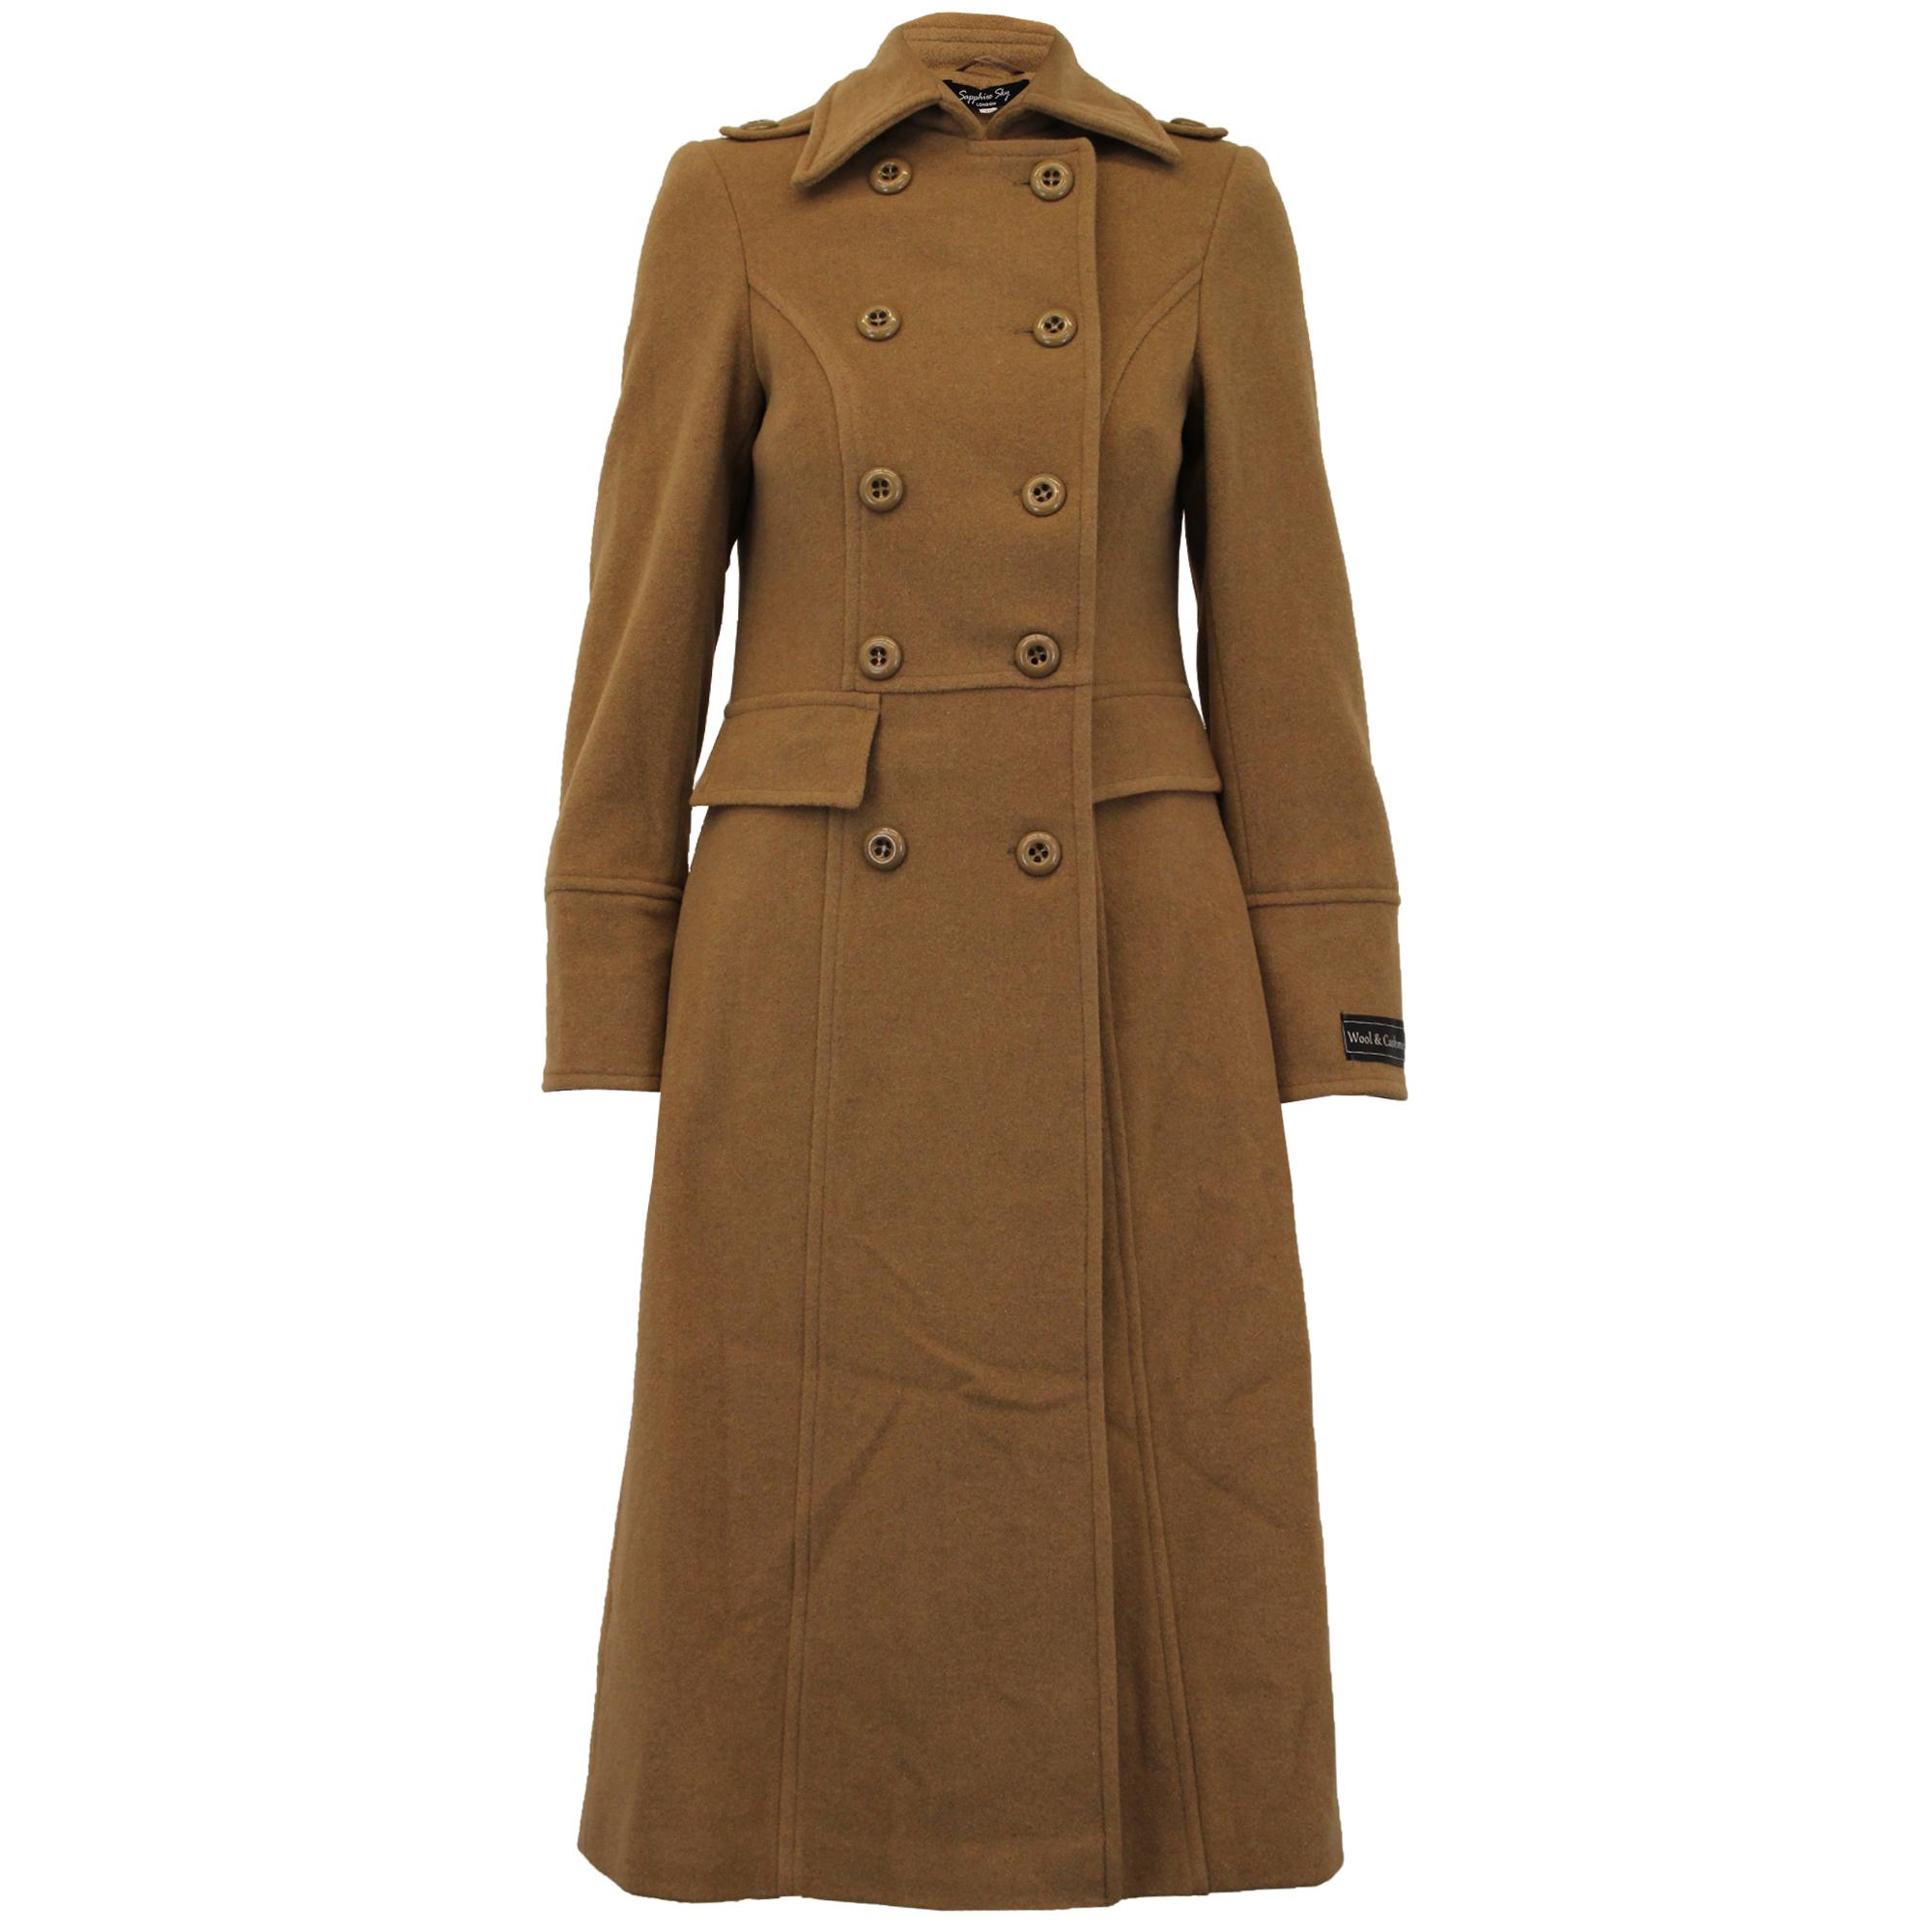 Wool cashmere overcoat